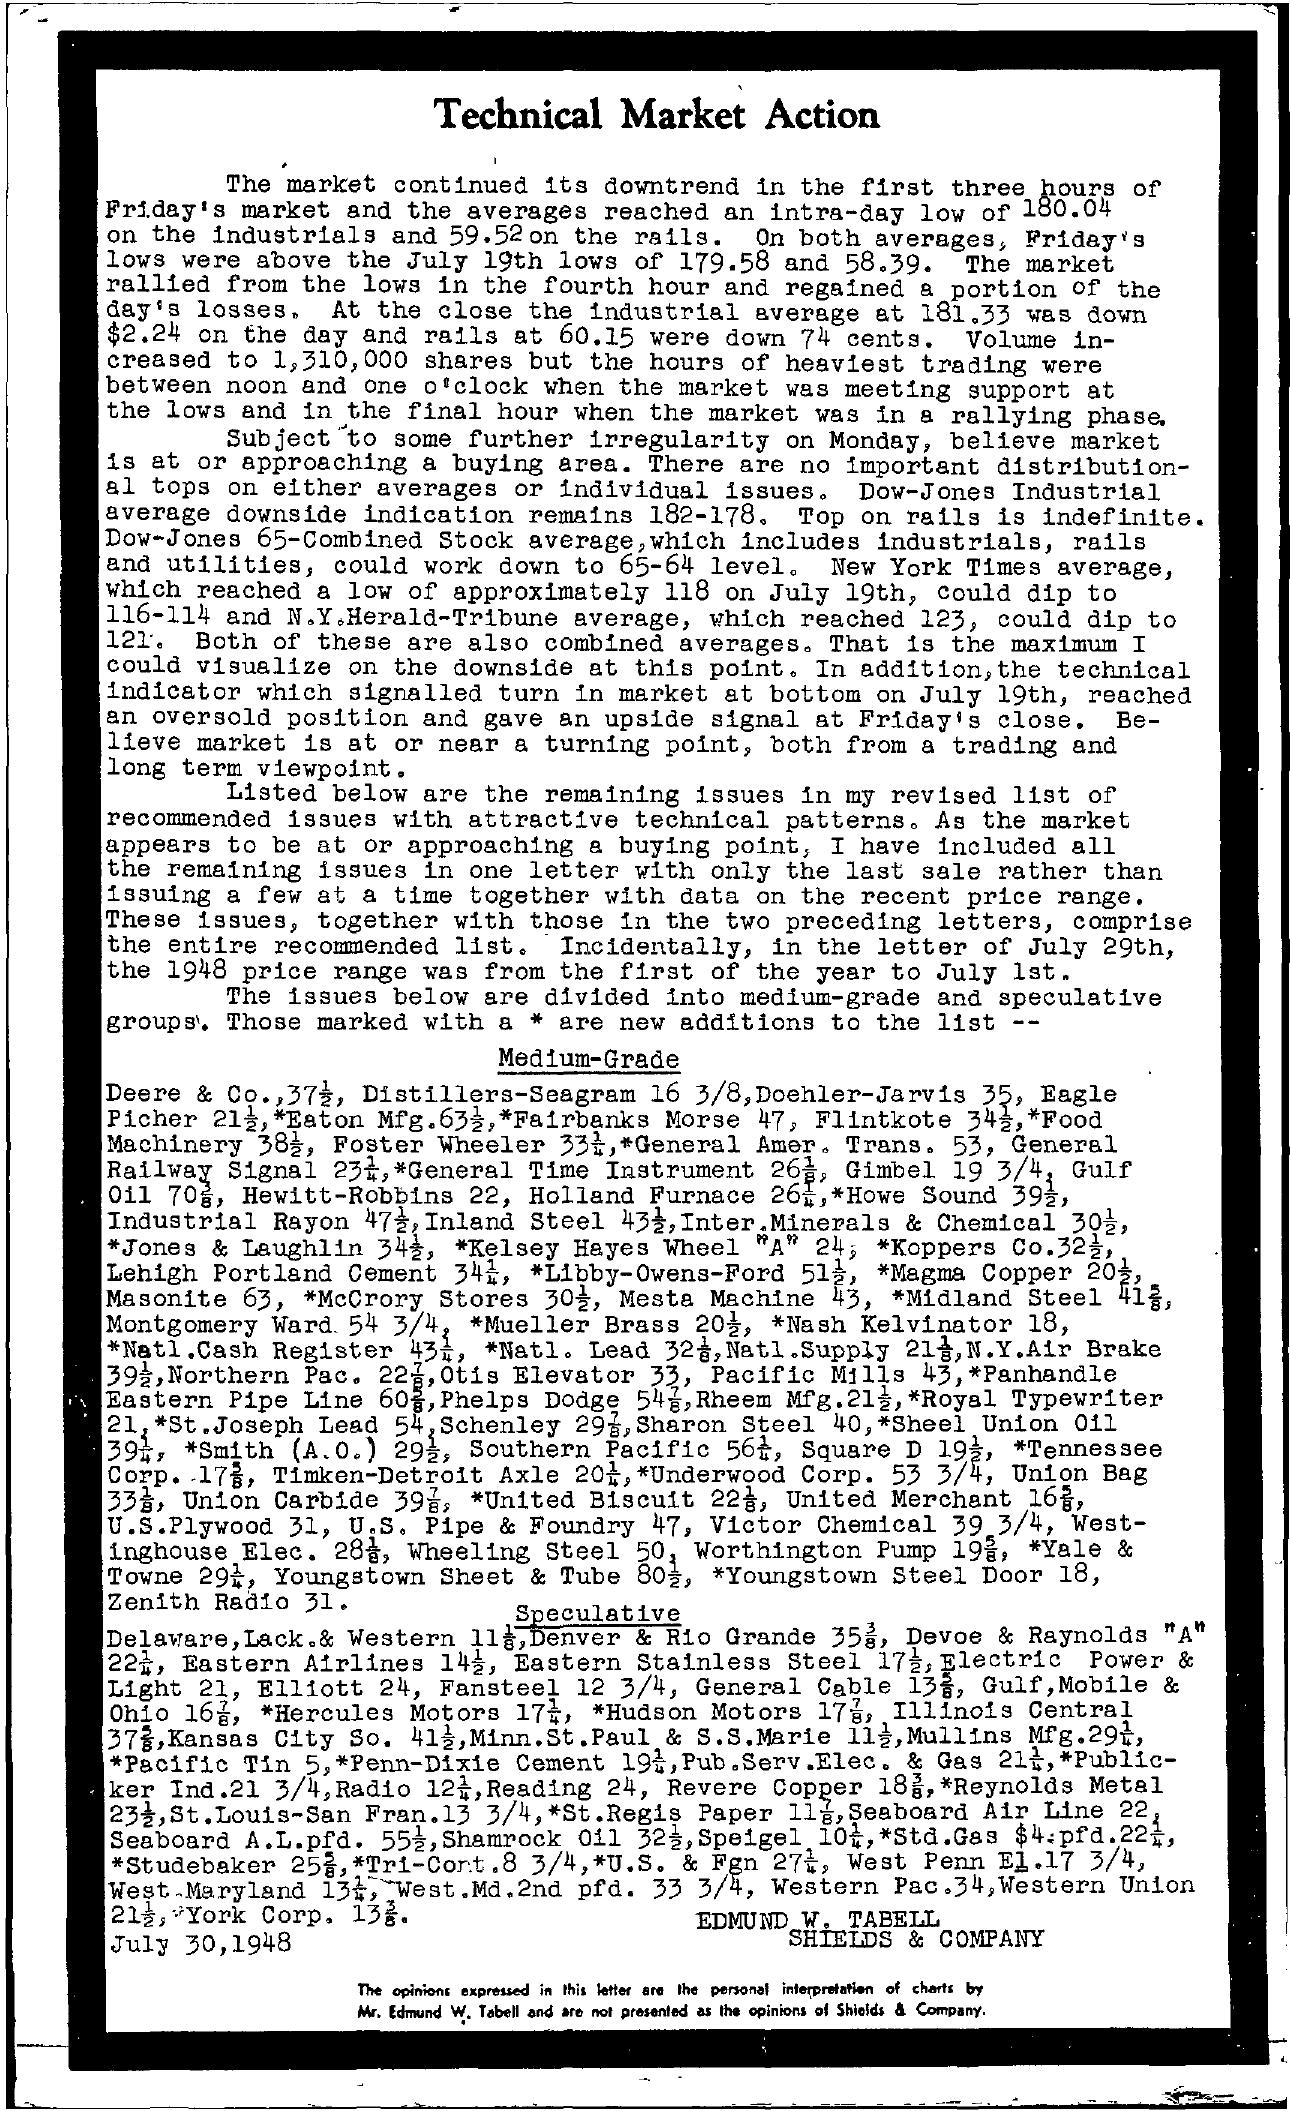 Tabell's Market Letter - July 30, 1948